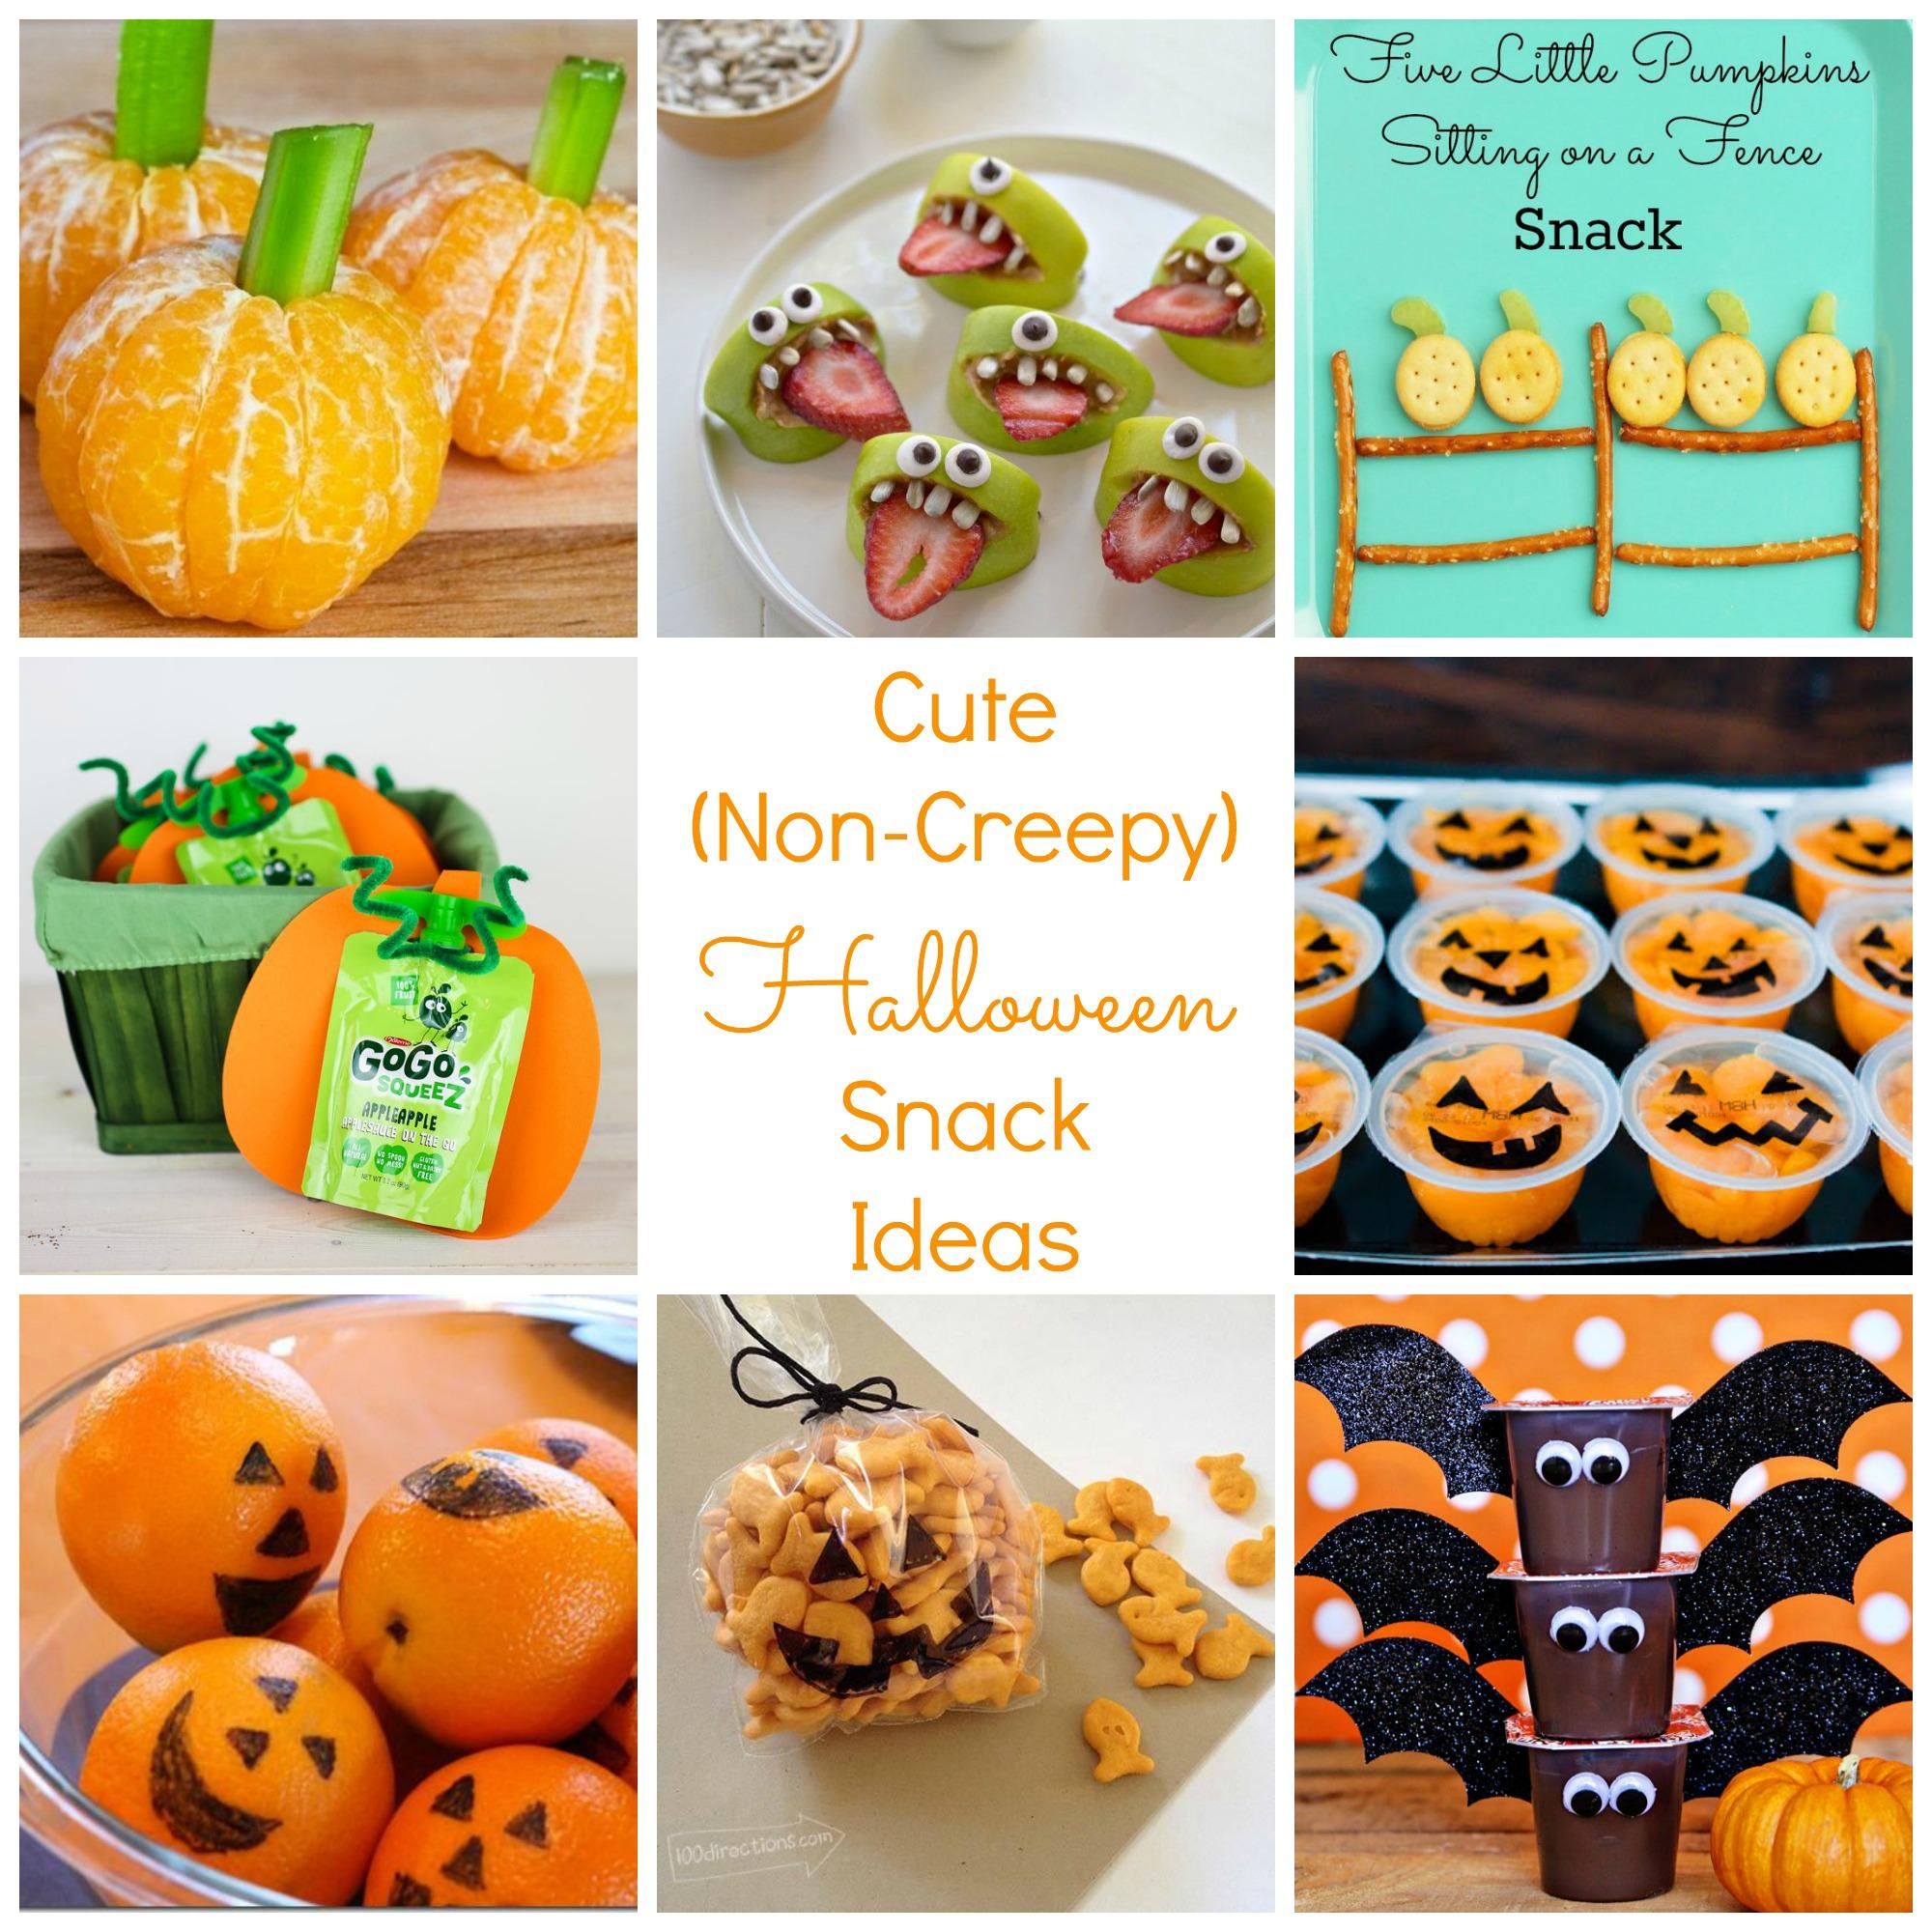 Party Ideas Snacks: Cute (Non-Creepy) Halloween And Fall Snack Ideas